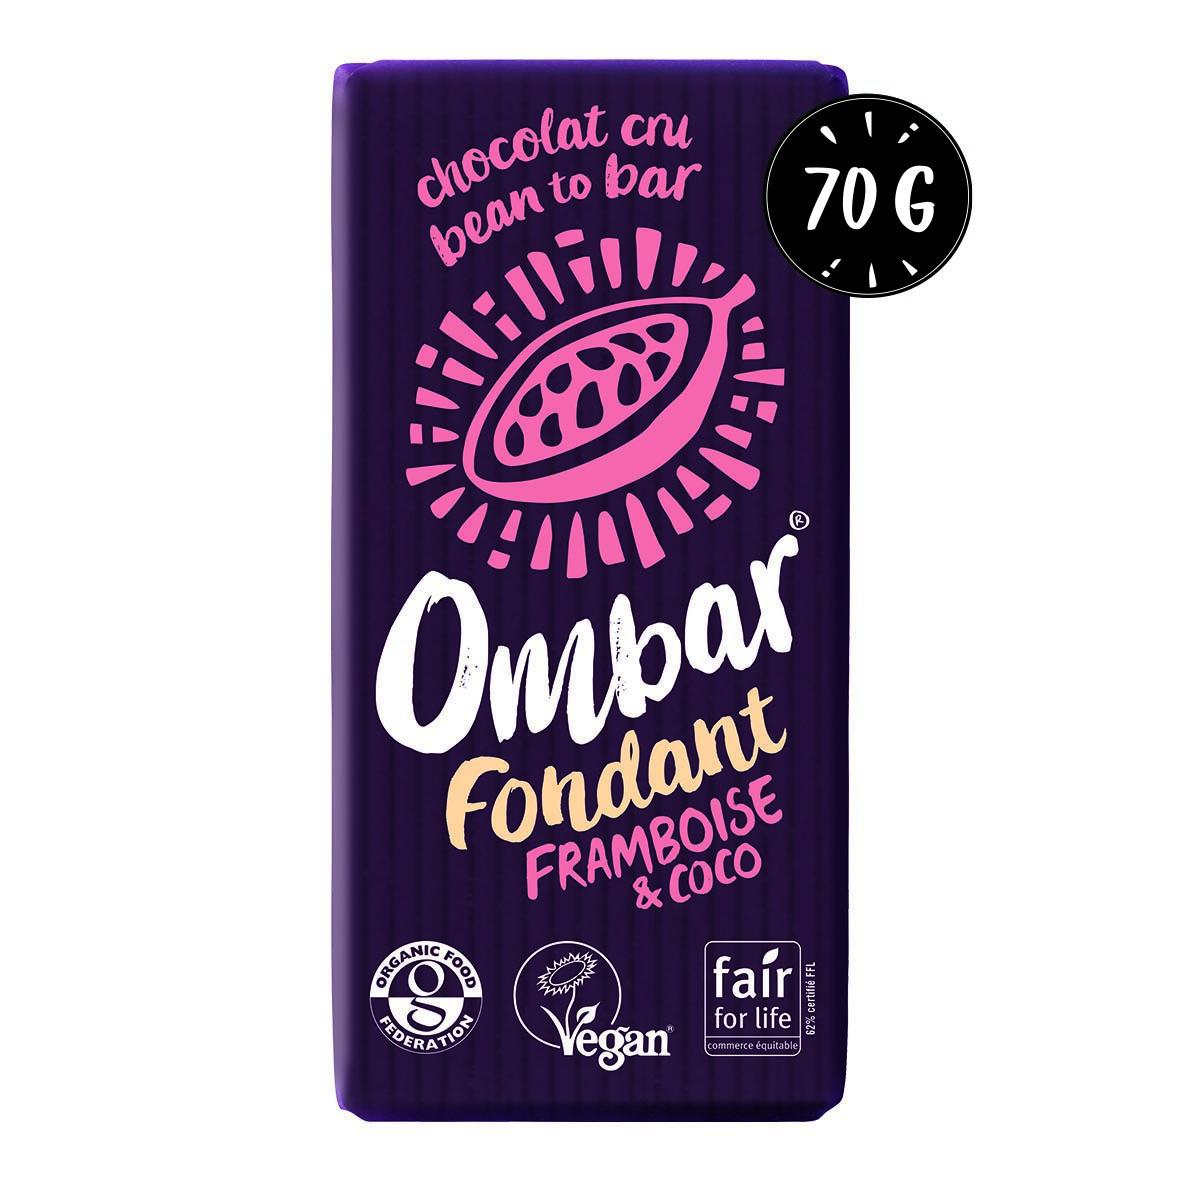 Chocolat CRU Fondant Framboise-Coco 70g